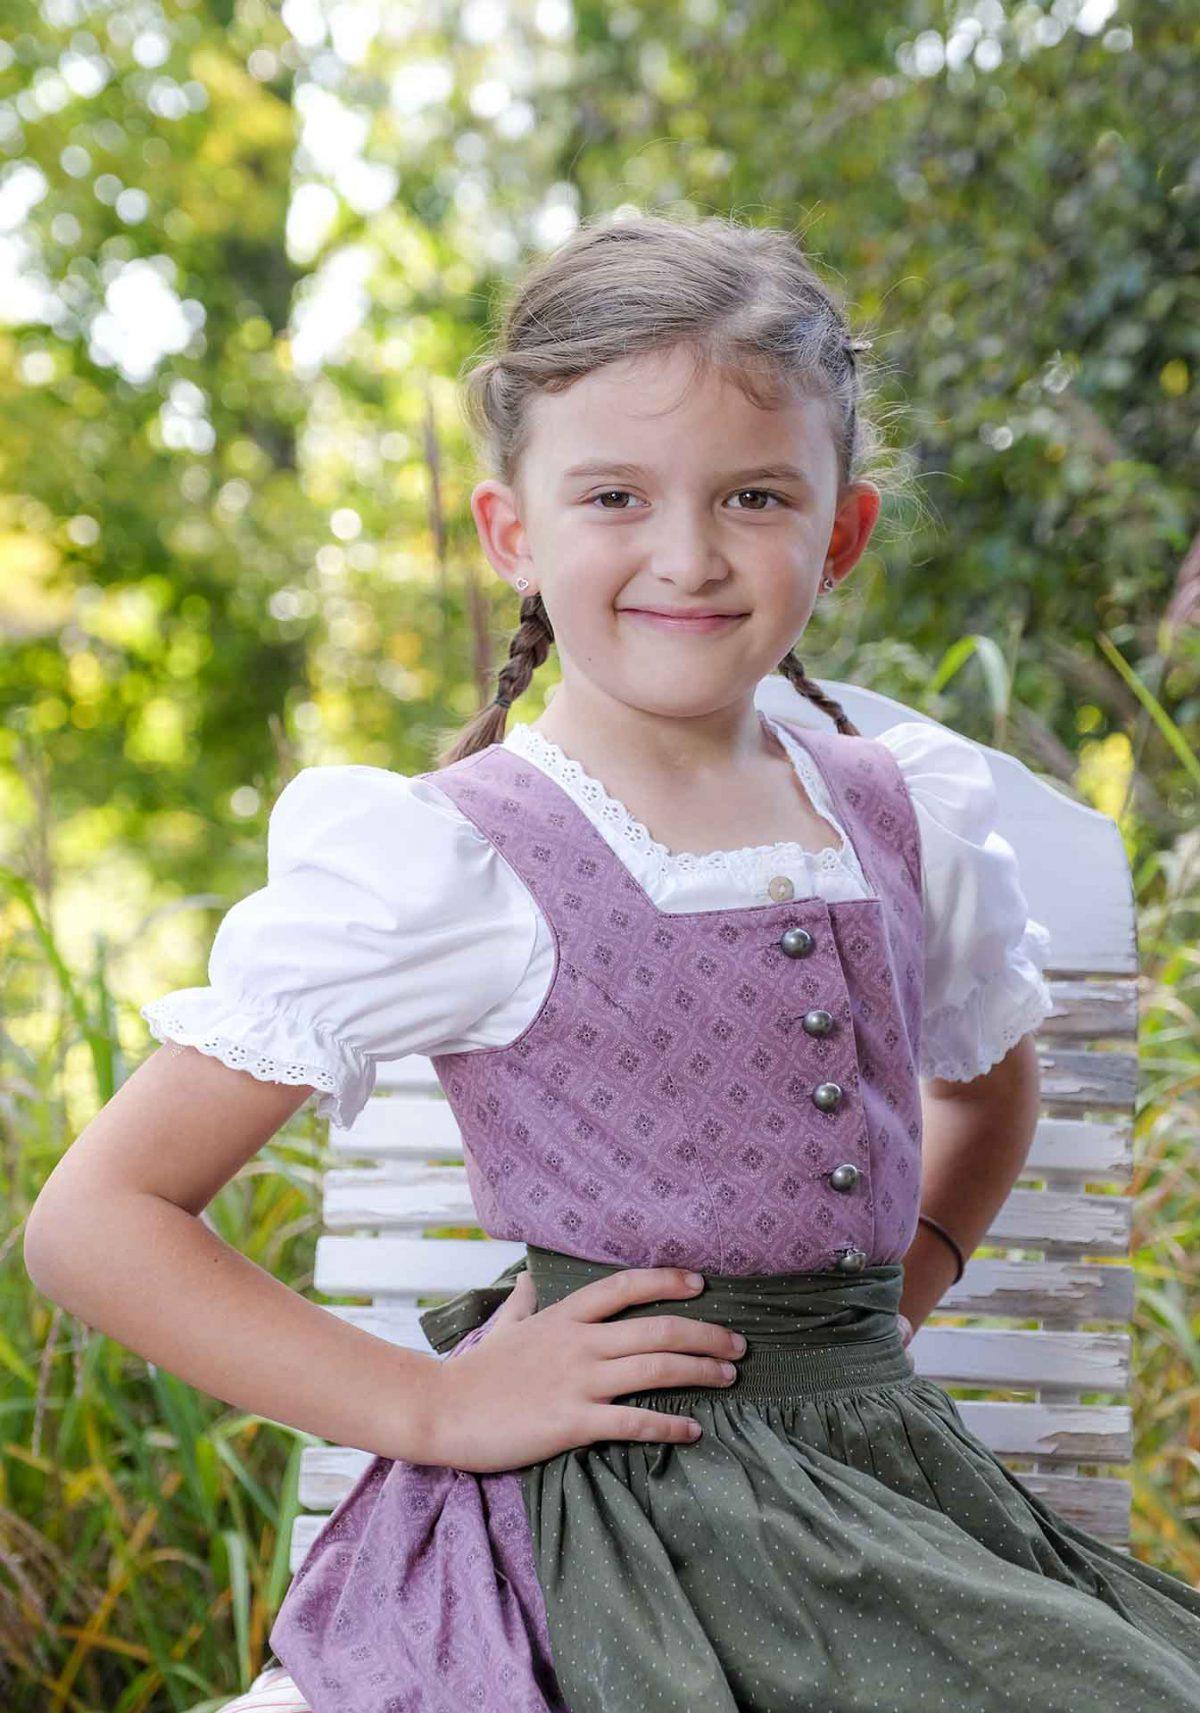 family-shooting-familienalbum-fotograf-tegensee-schliersee-andreas-leder